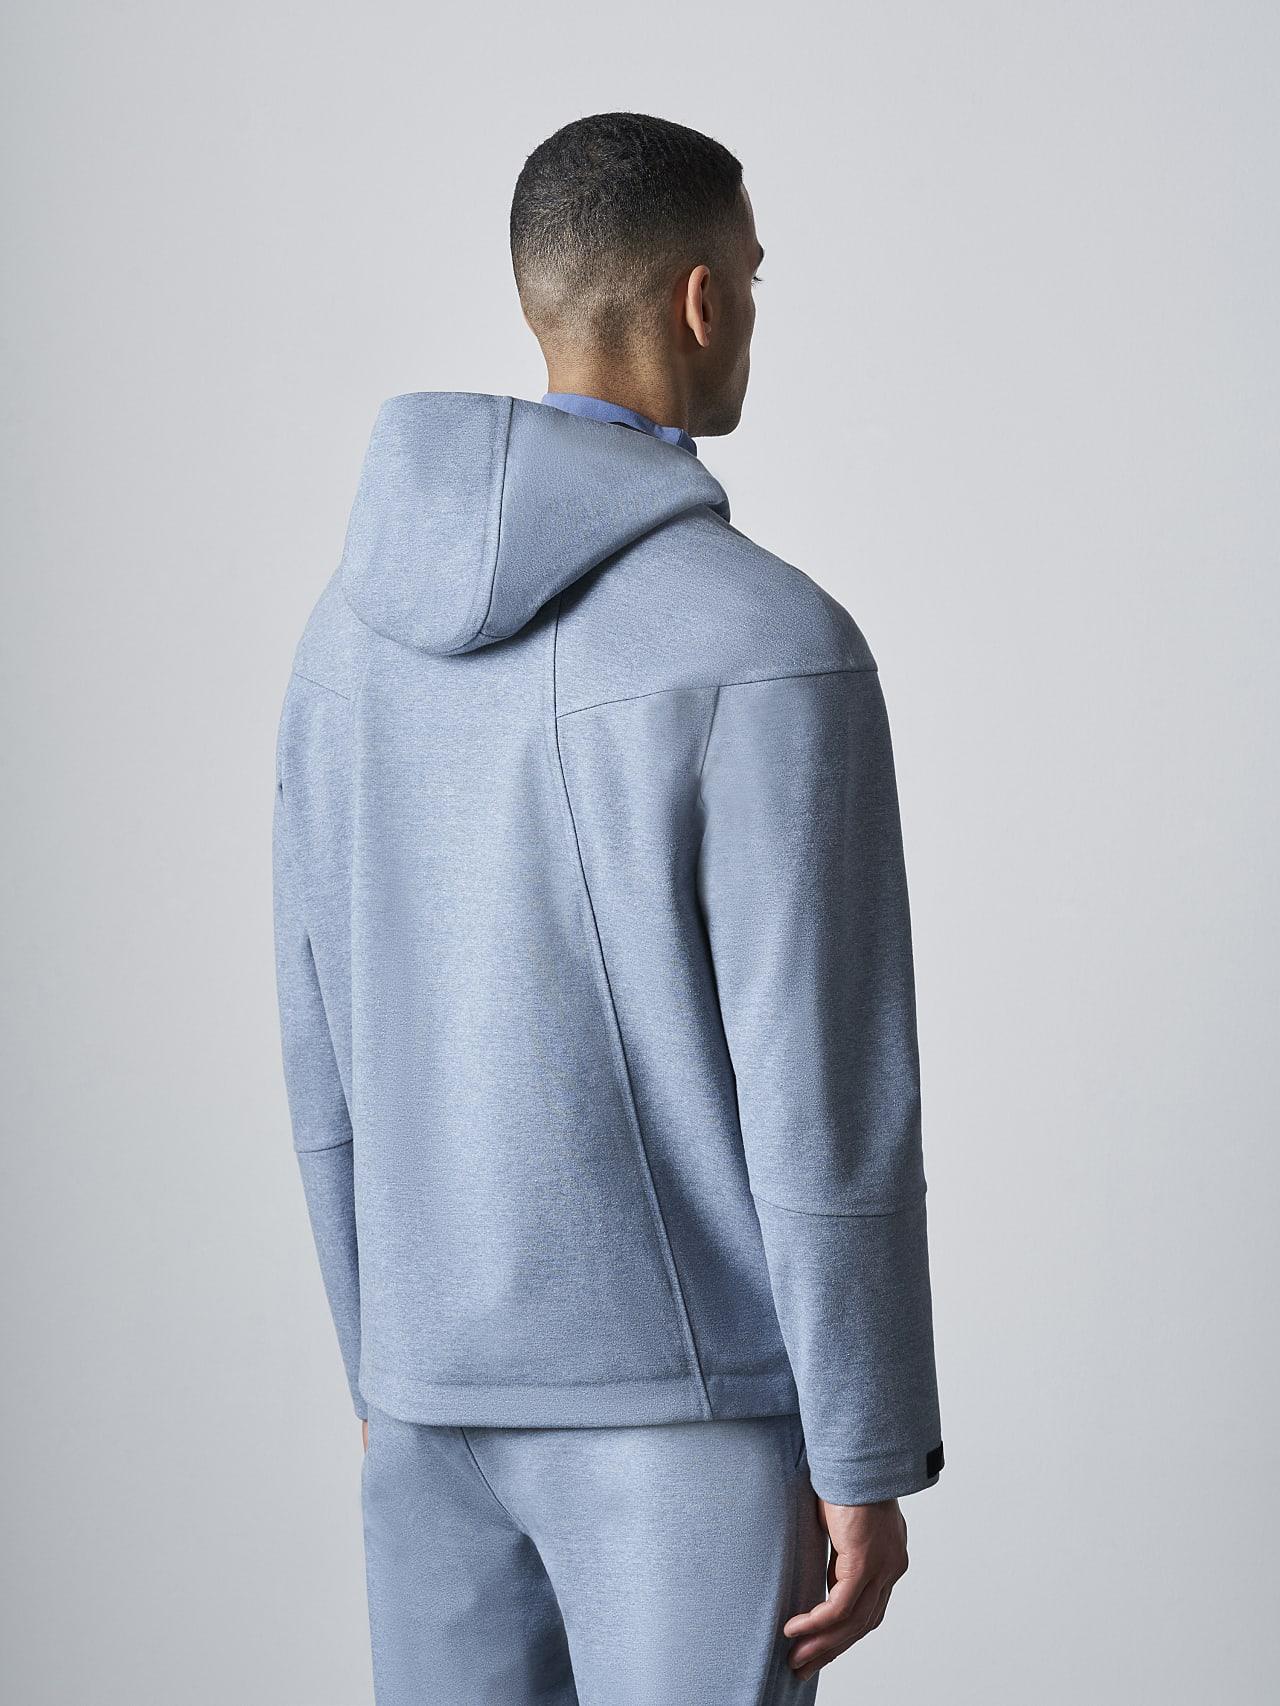 SROTE V1.Y5.02 Waterproof Sweatjacket medium blue Front Main Alpha Tauri